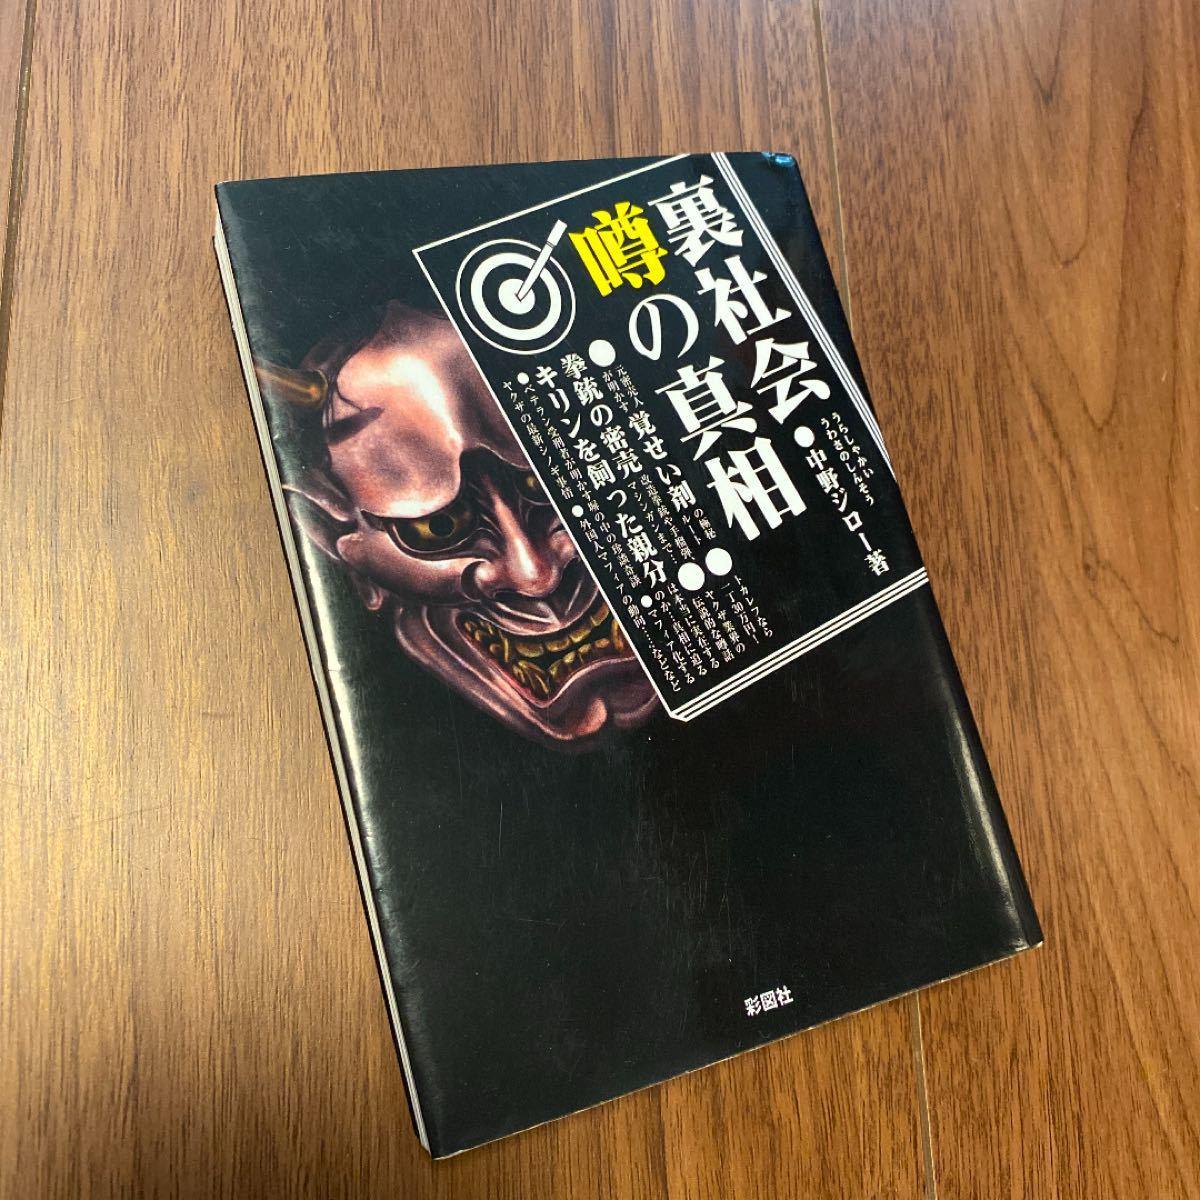 中古文庫 ≪趣味・雑学≫ 裏社会 噂の真相 / 中野ジロー